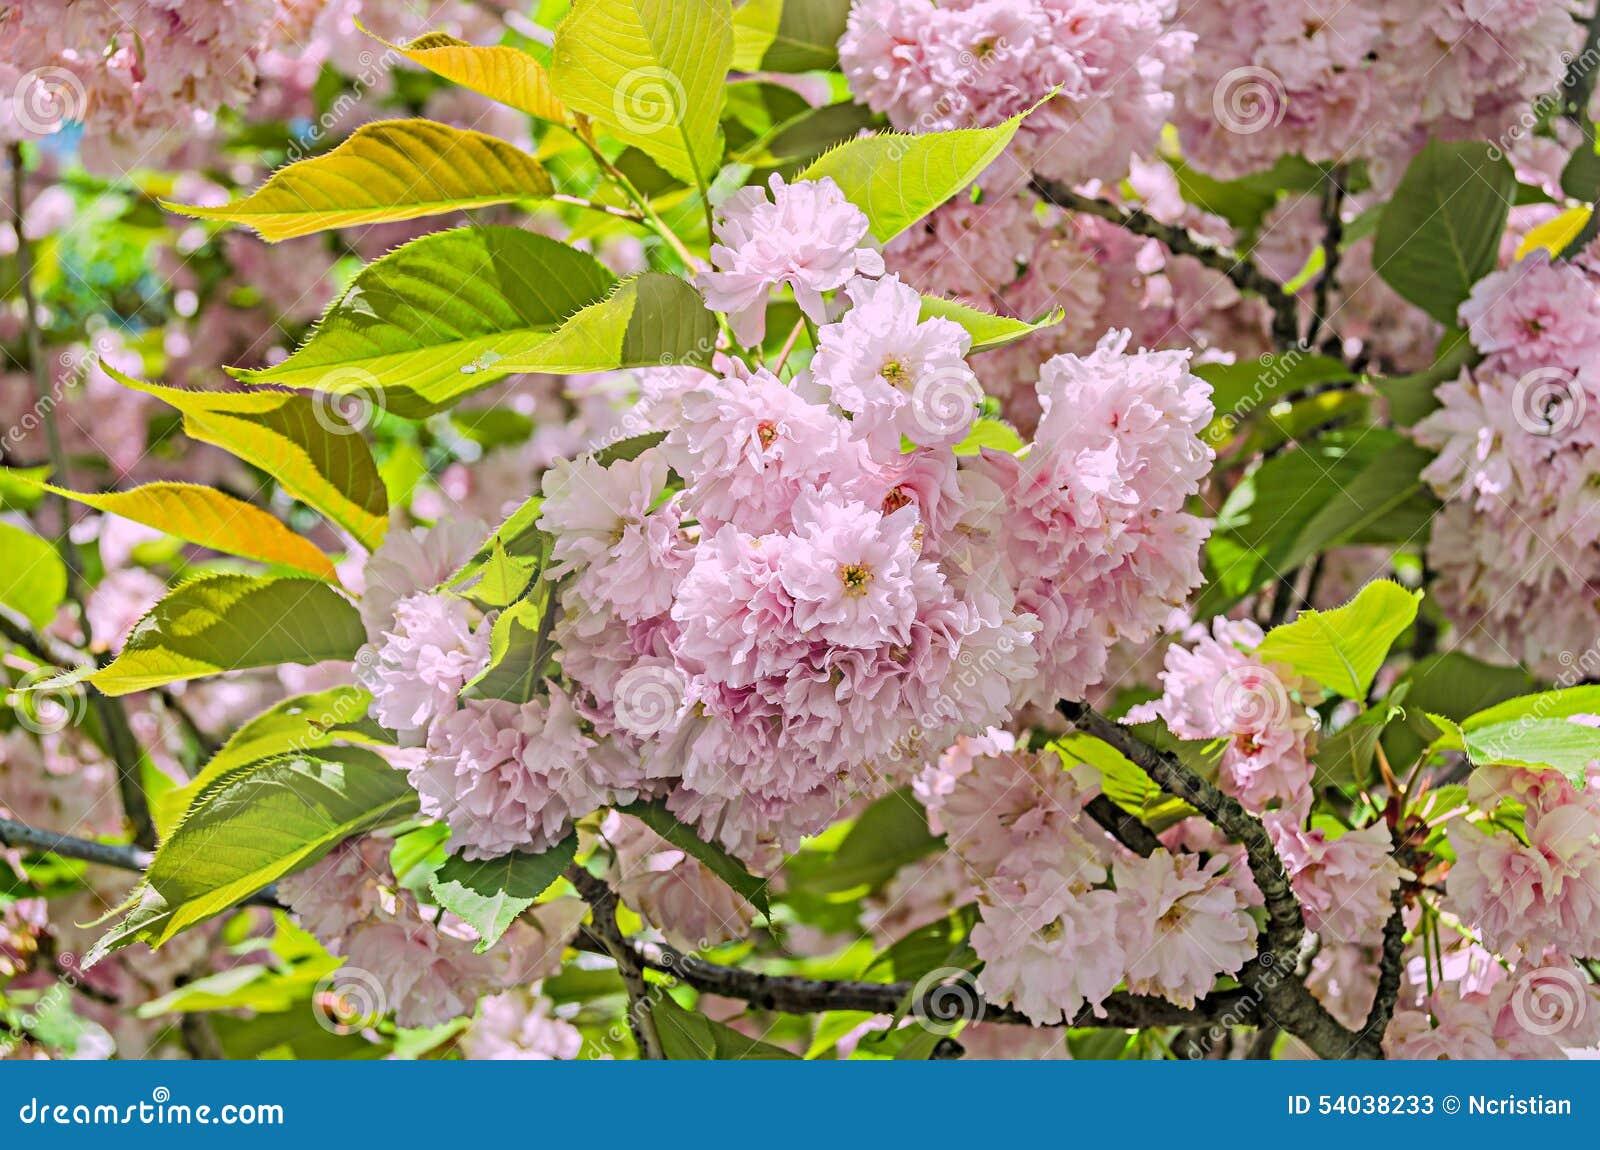 Pink Tree Flowers Of Prunus Serrulata Kanzan Branch Flowers